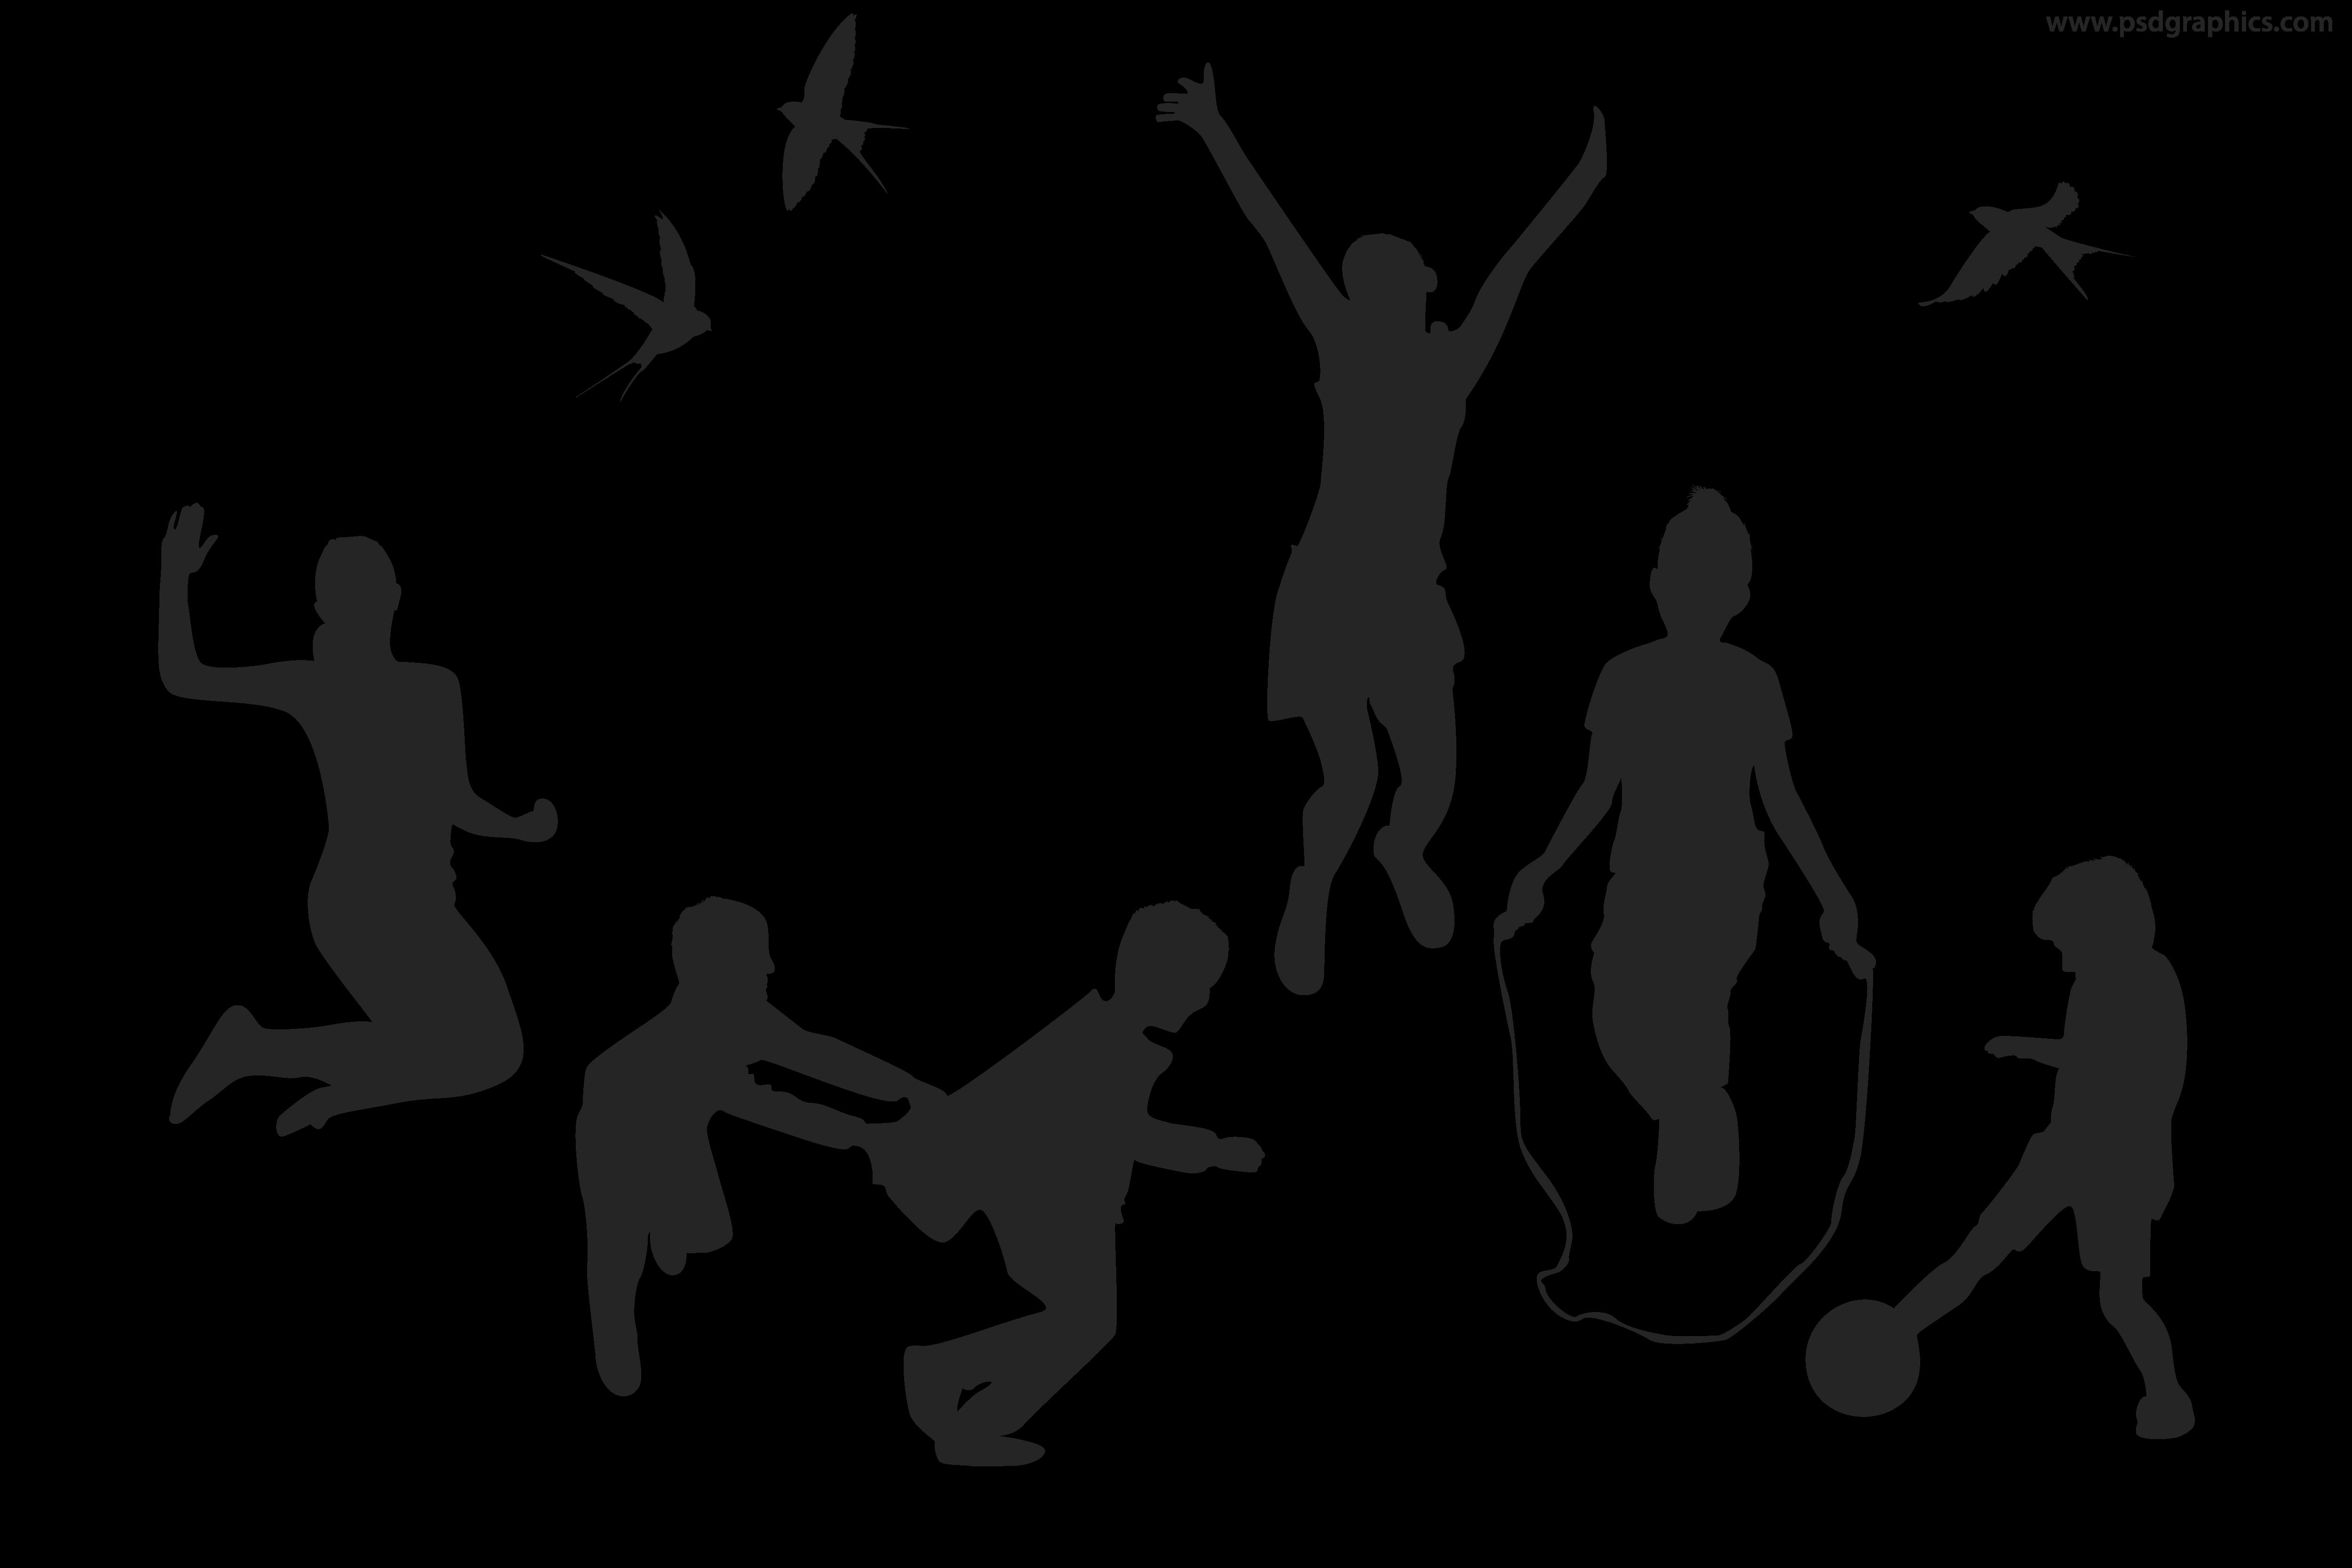 Playful Children Vector Silhouettes